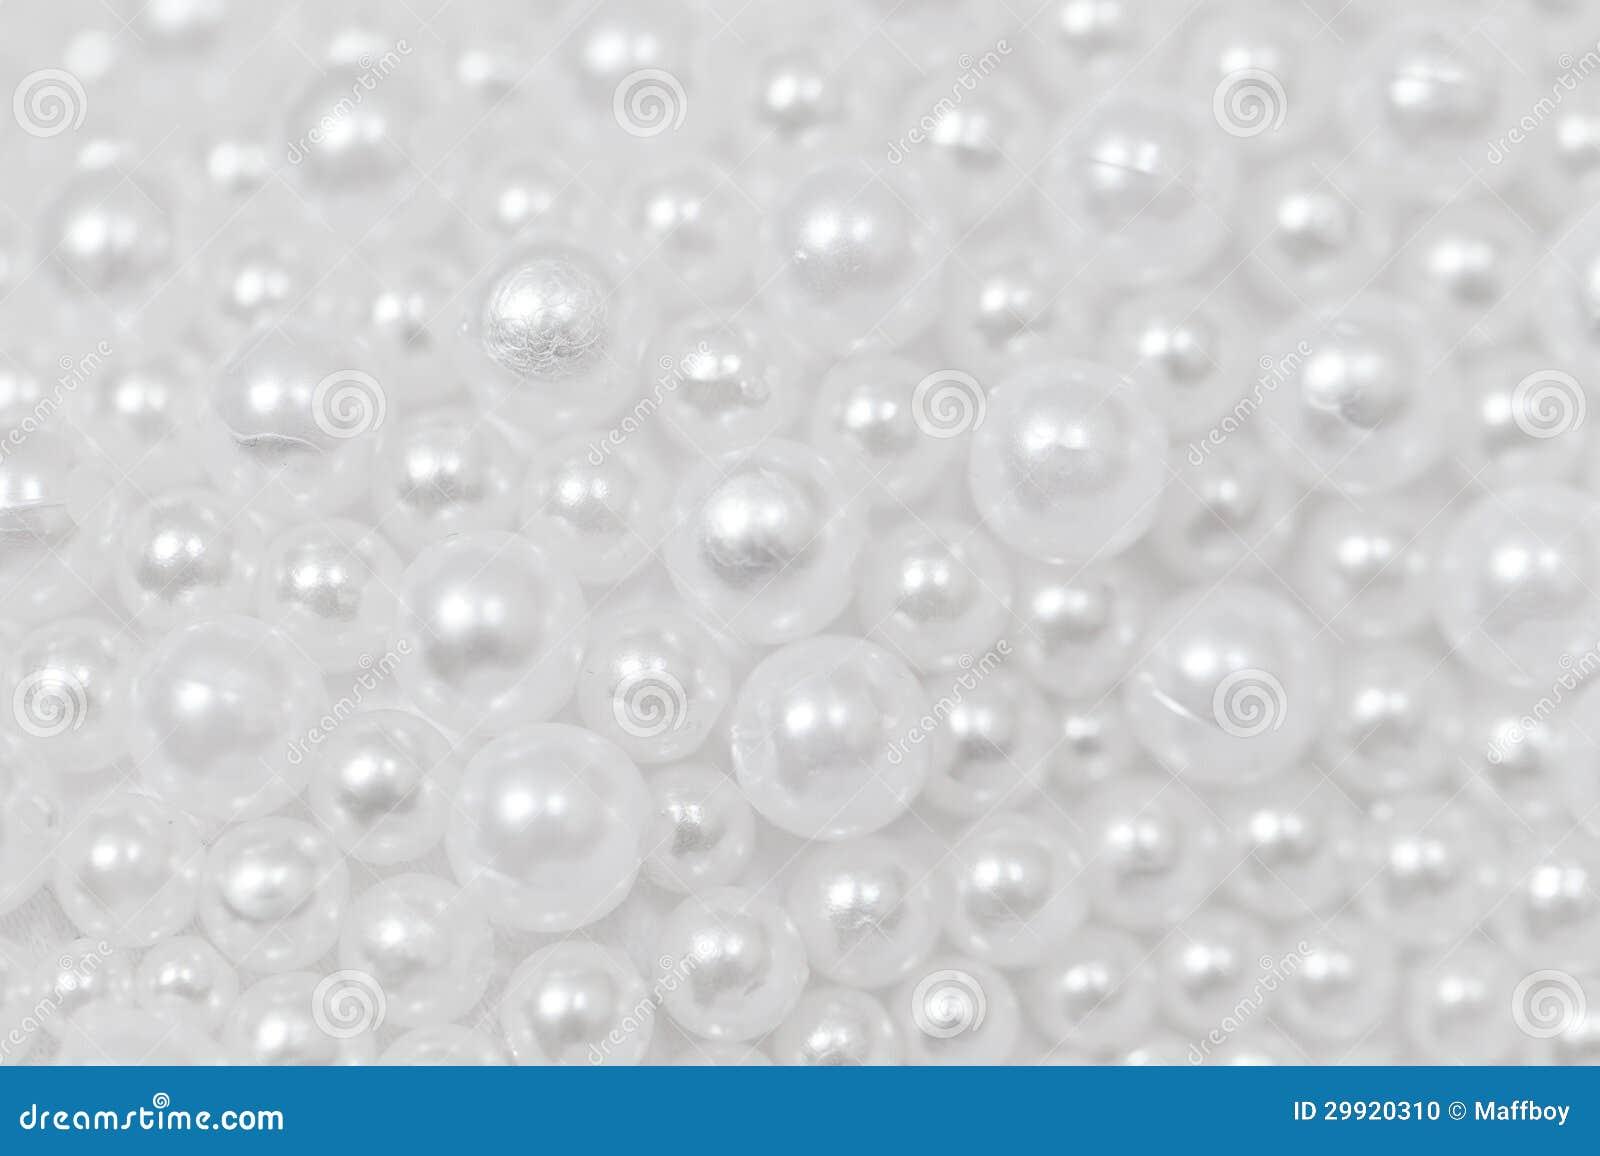 White Beads Stock Photo Image 29920310